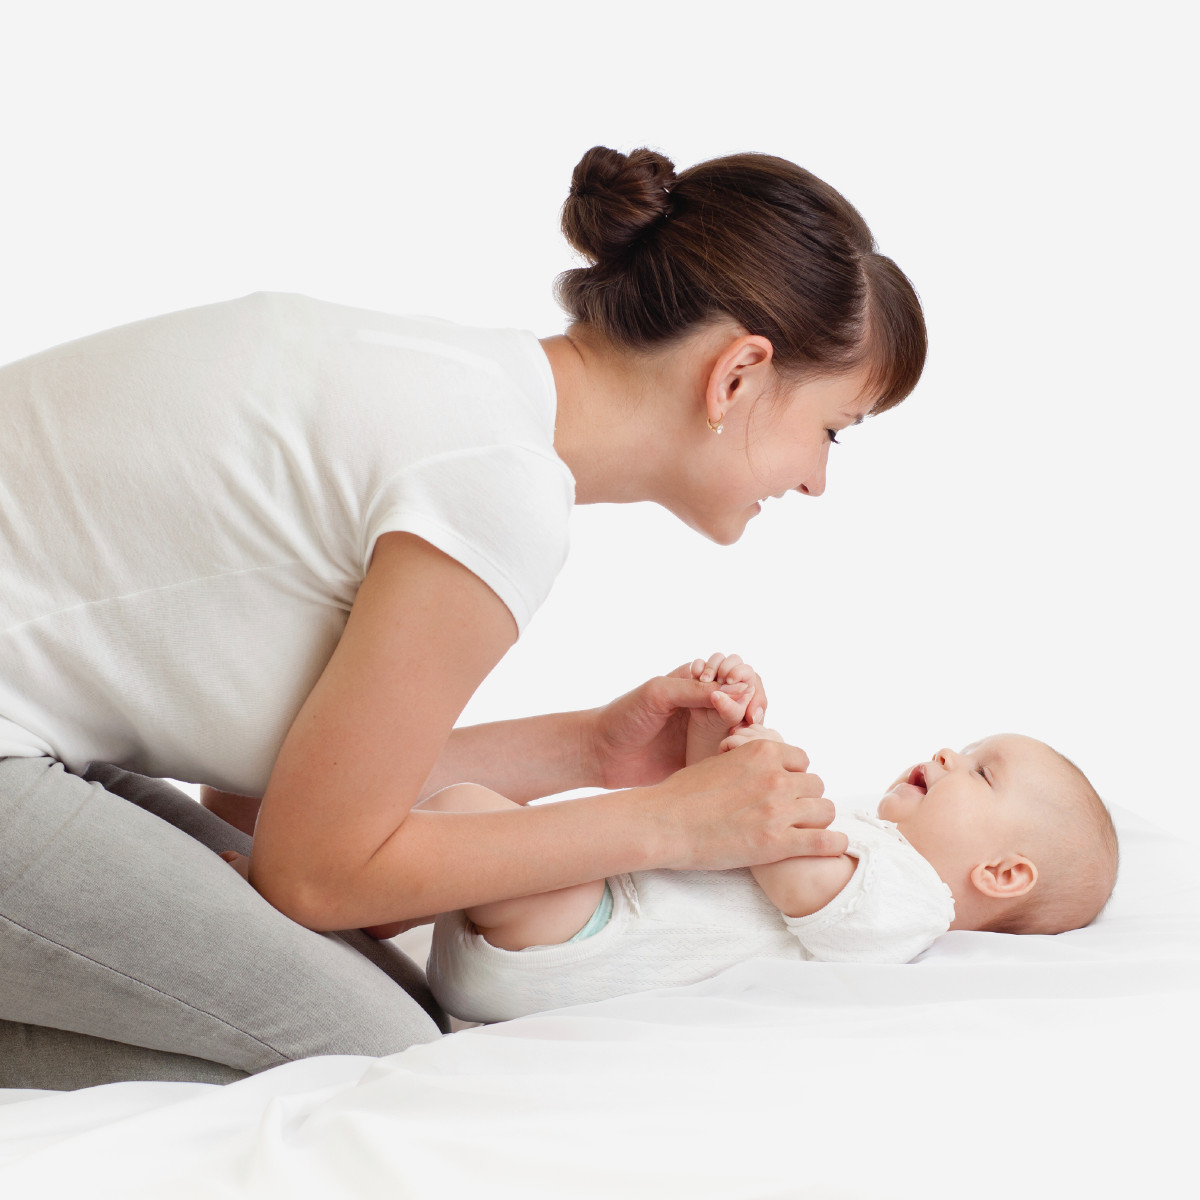 massagens-para-bebes-a-tecnica-shantala-massagem